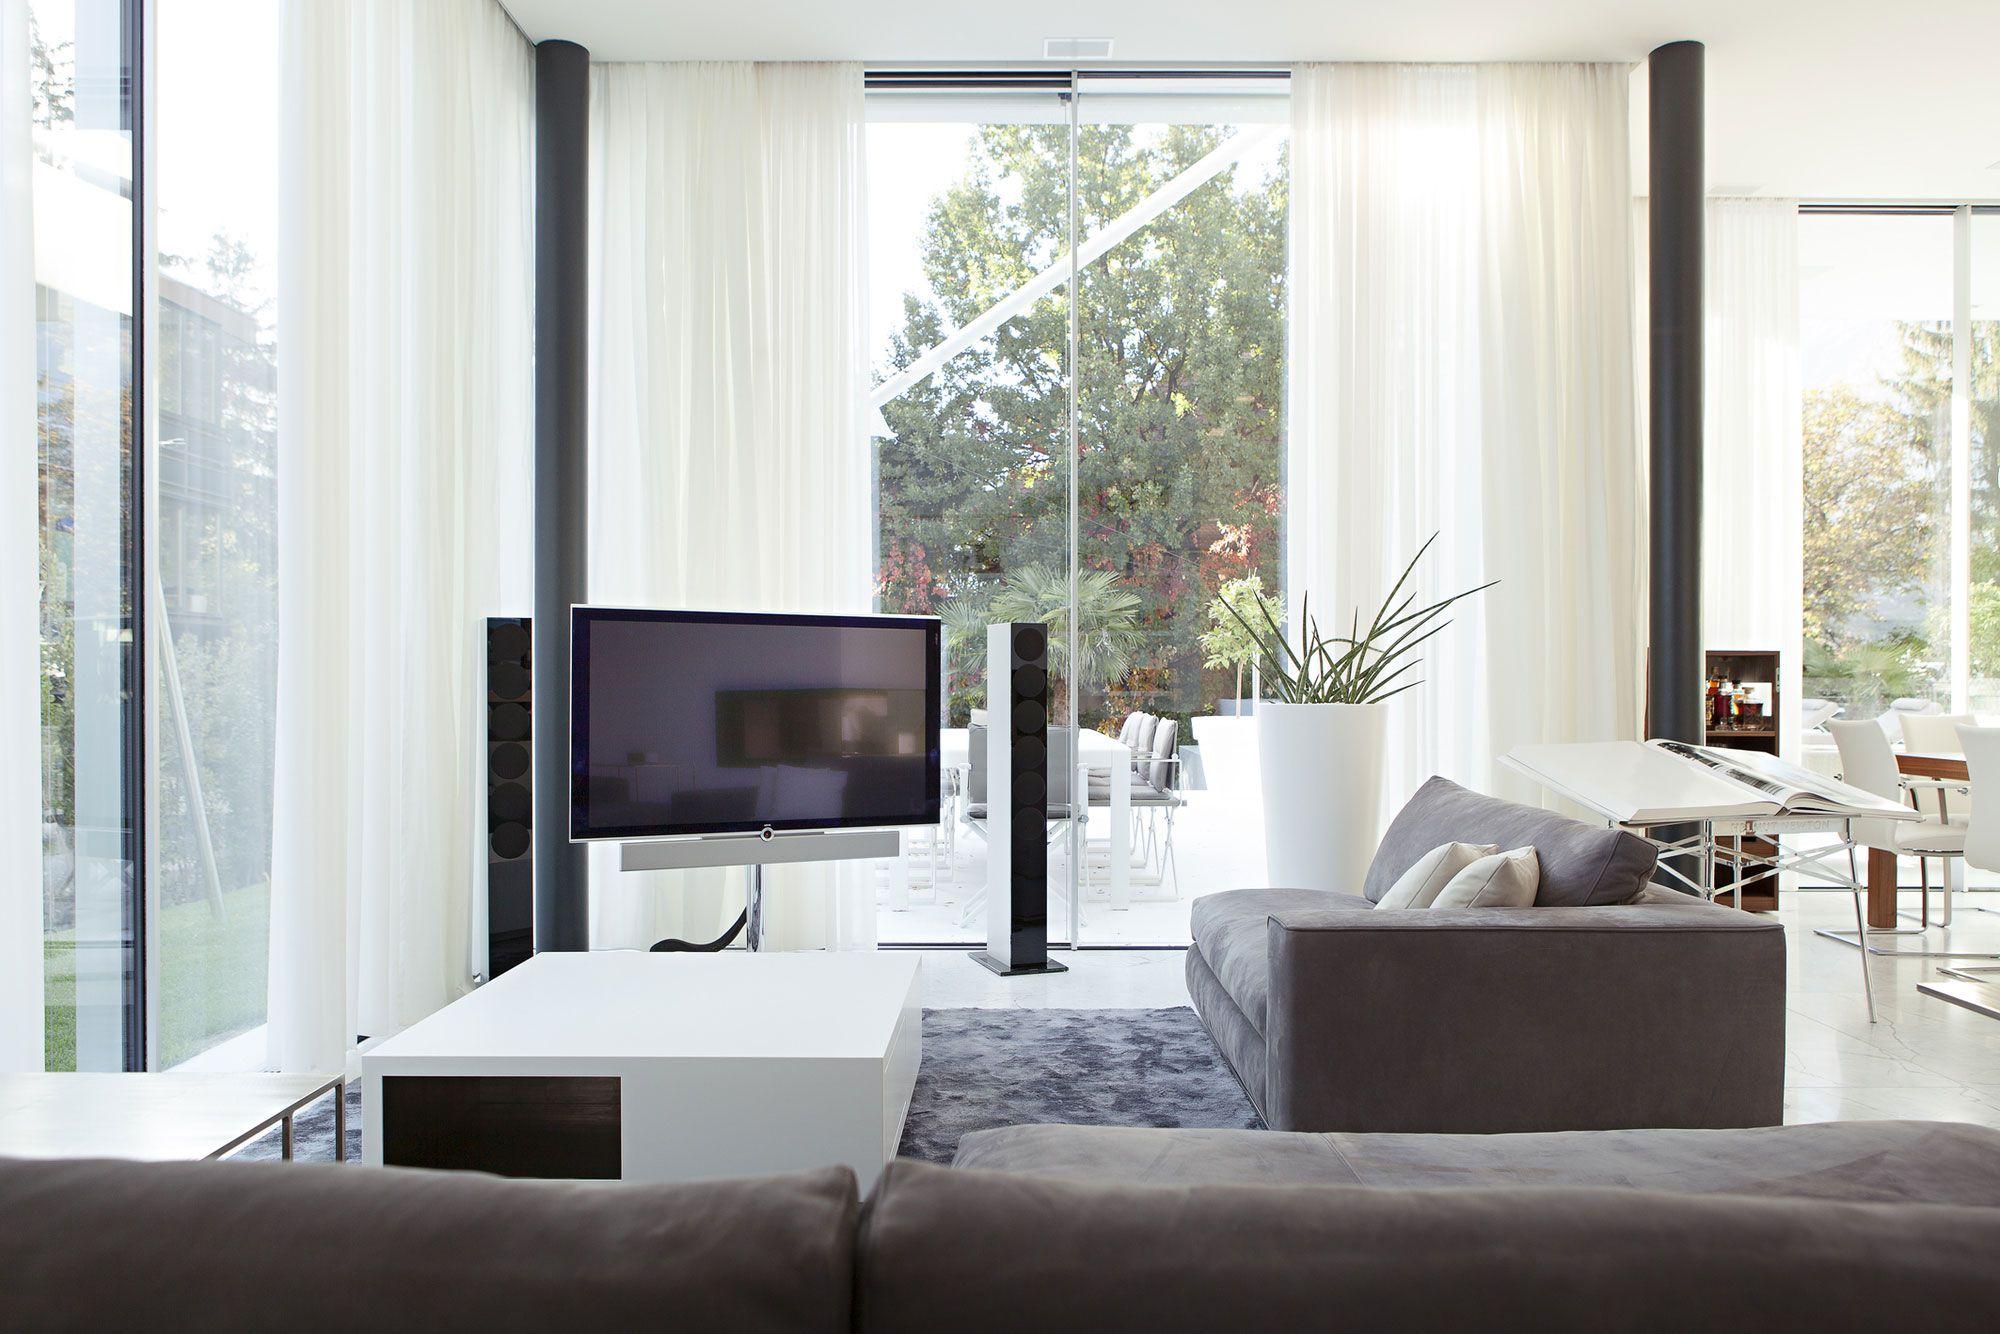 Cozyapartmentideas Interior Design Ideas Cozy Apartment Living House M By  Monovolume Architecture Design CAANdesign Cozy Apartment